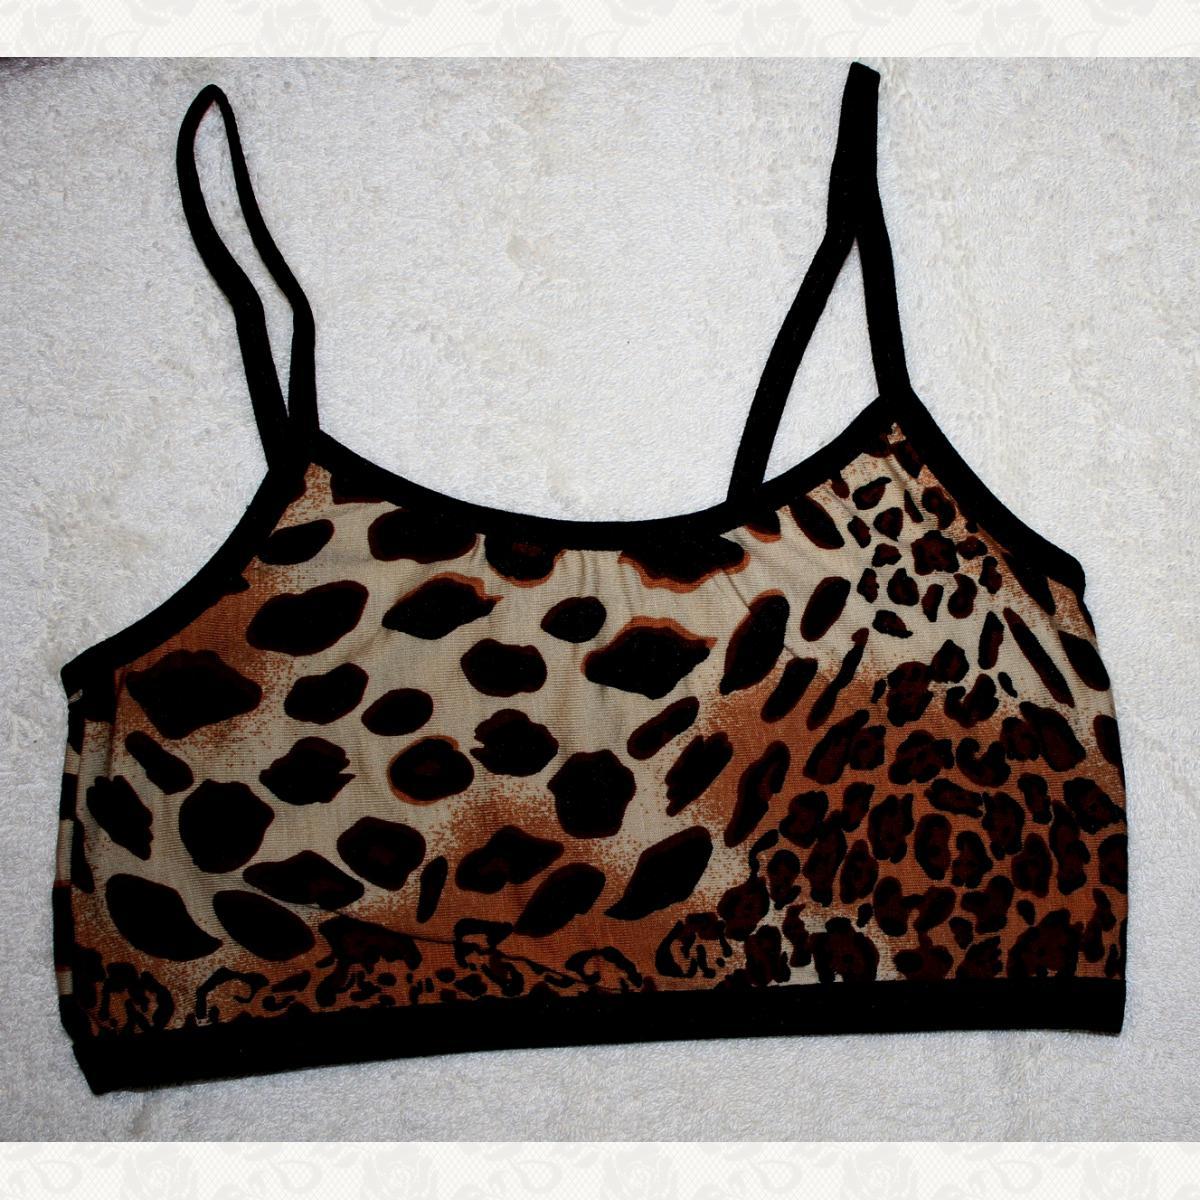 Топ девичий, цвет леопард, 12 шт.